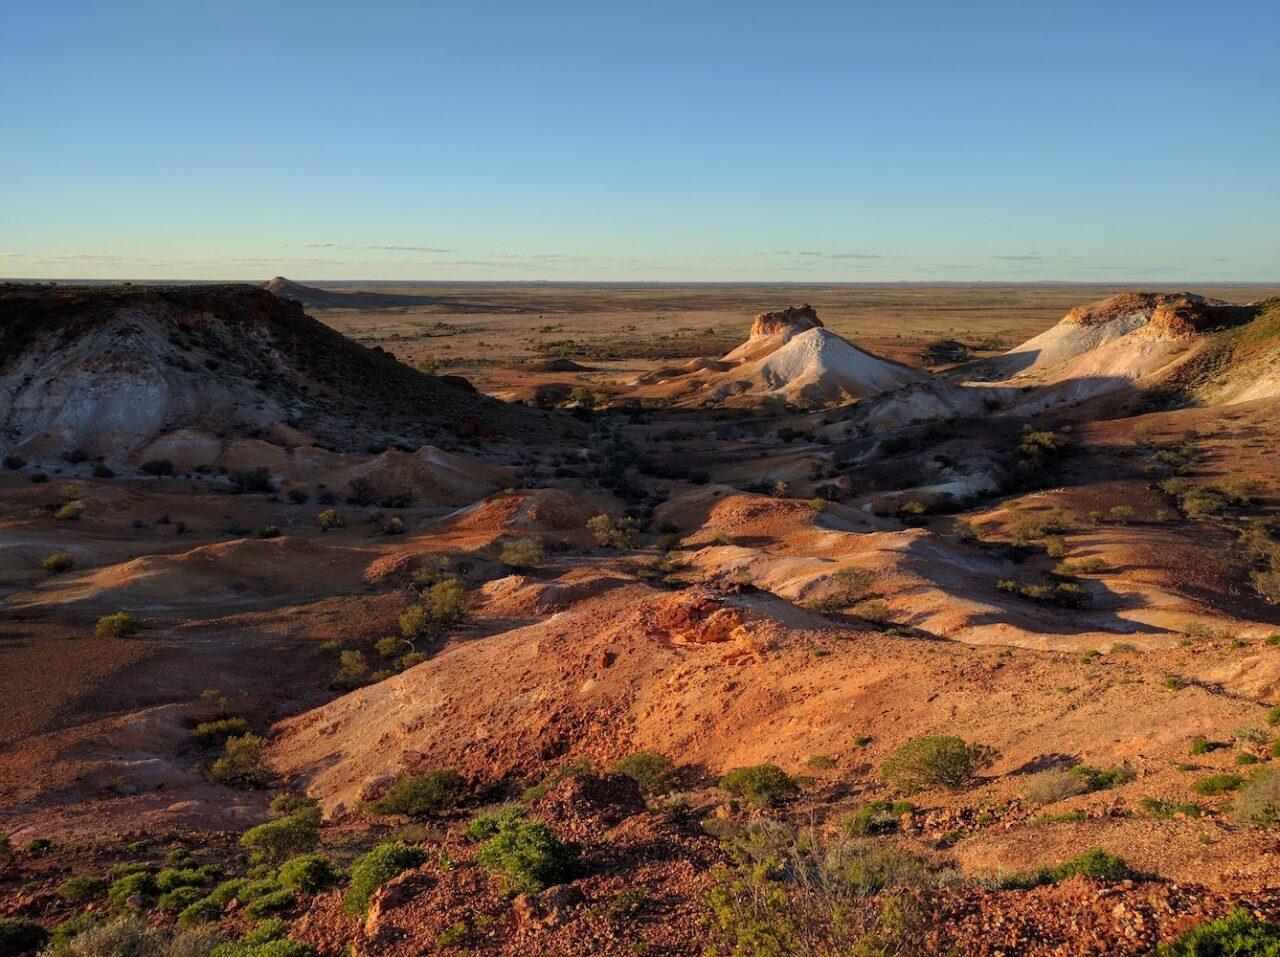 Breakaways hills – site of Mad Max, Pitch Black, etc